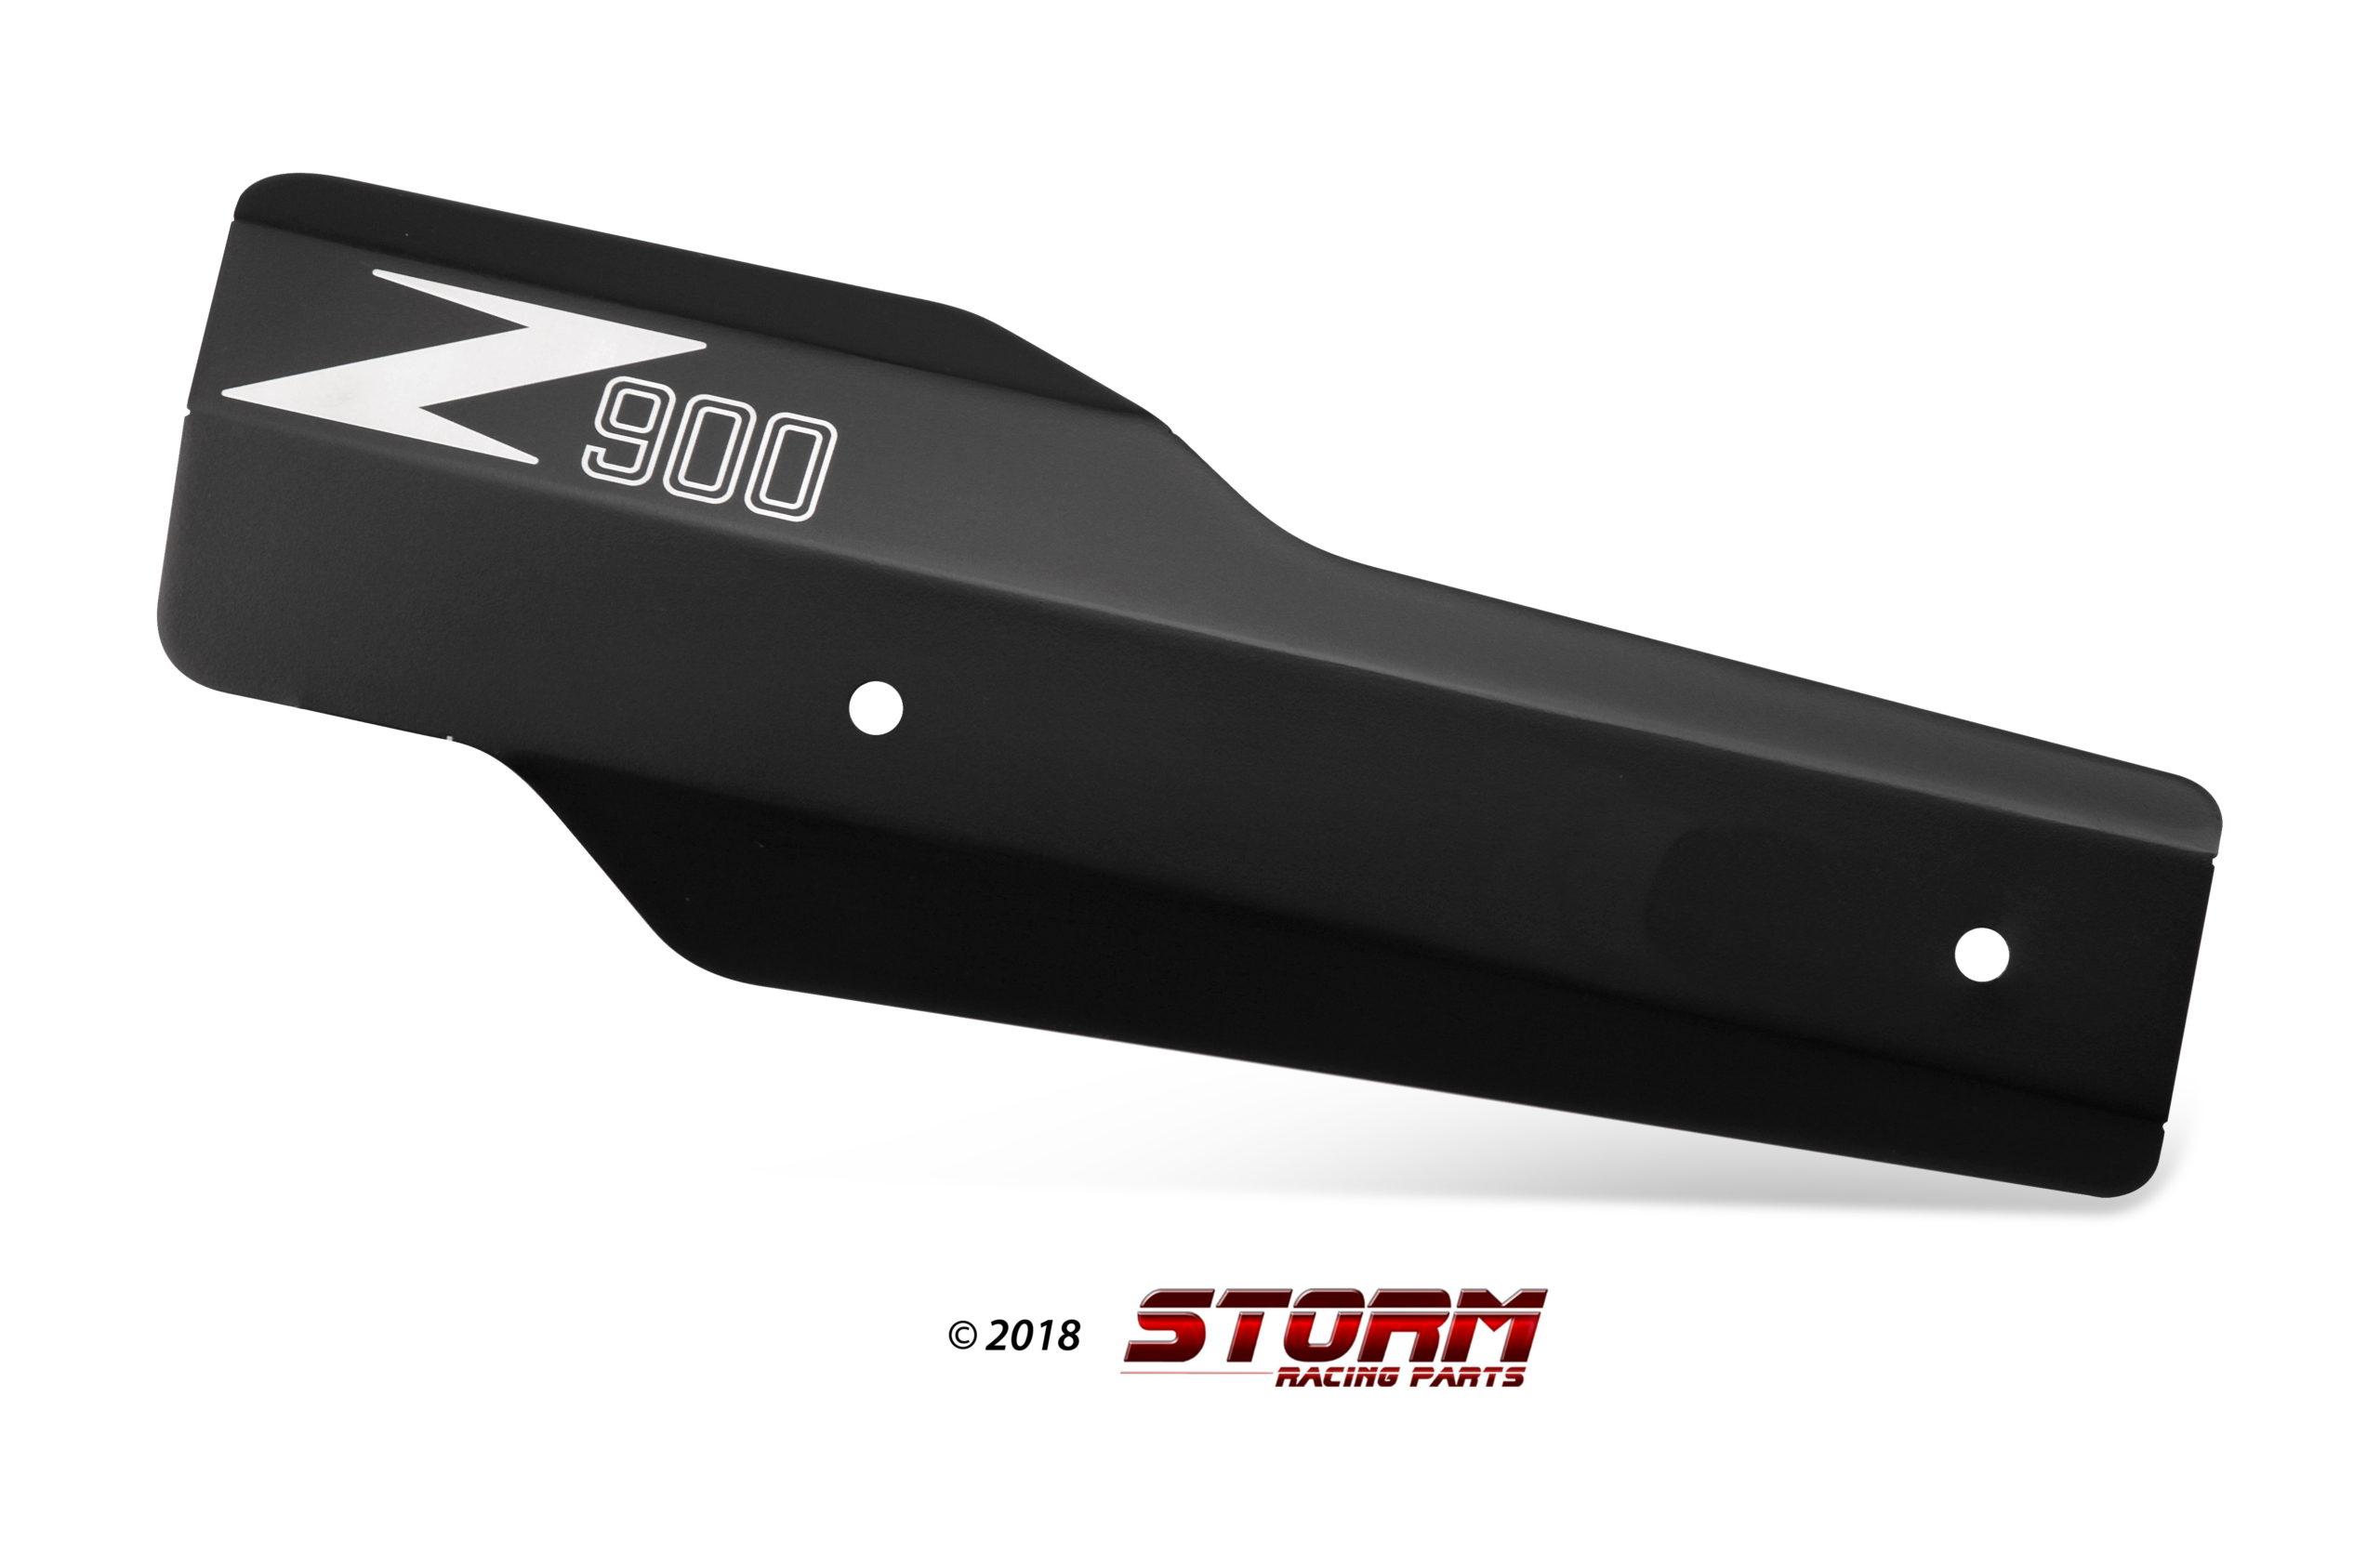 cover in acciaio Storm 50.DK.038.0 per KAWASAKI Z900 A2 (35/70 KW)